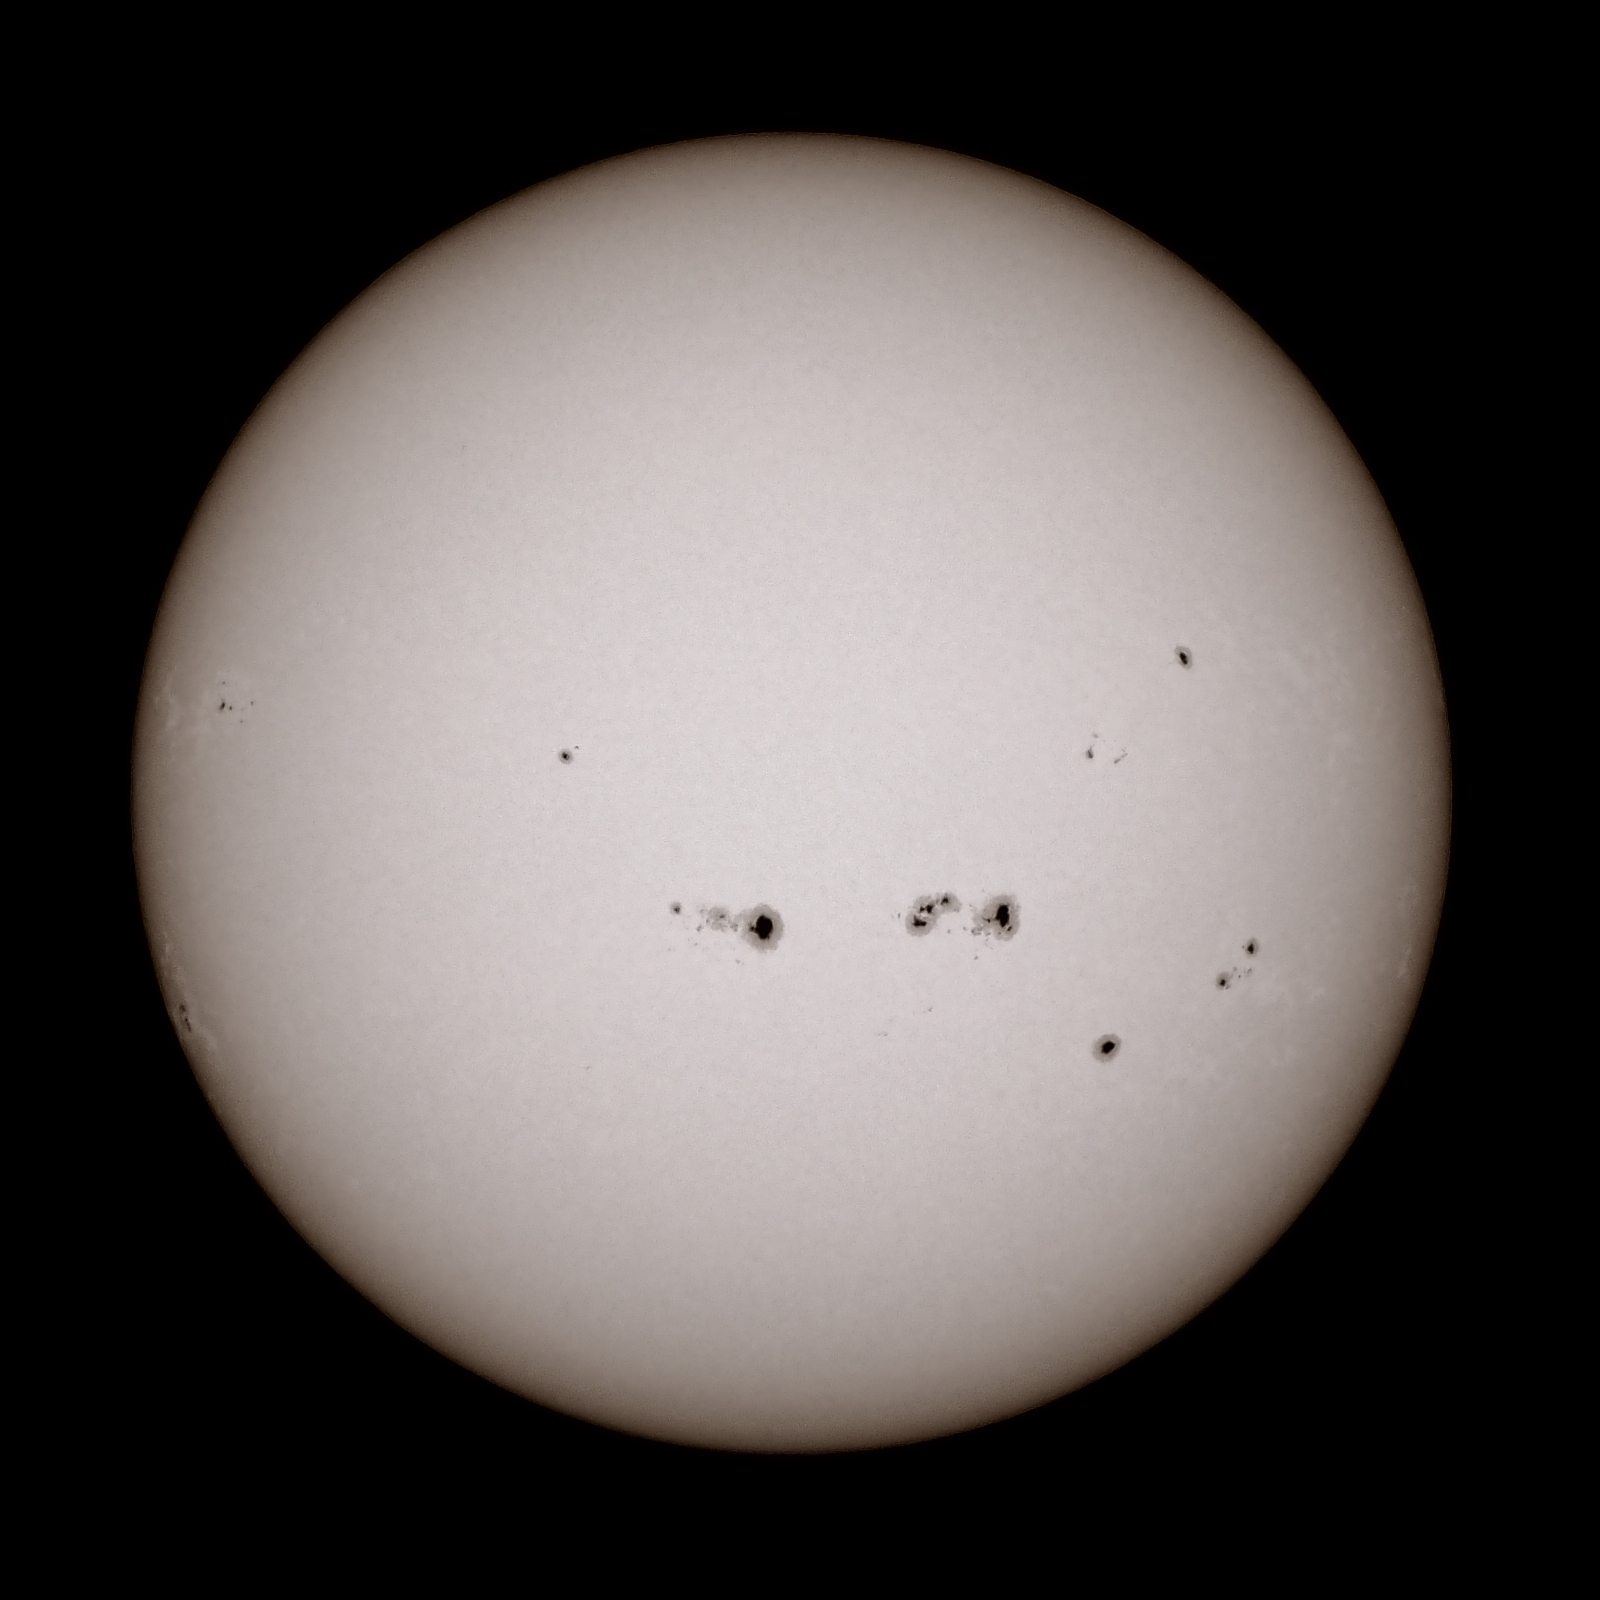 AstroArts: 投稿画像ギャラリー ... : 月の月齢 : すべての講義